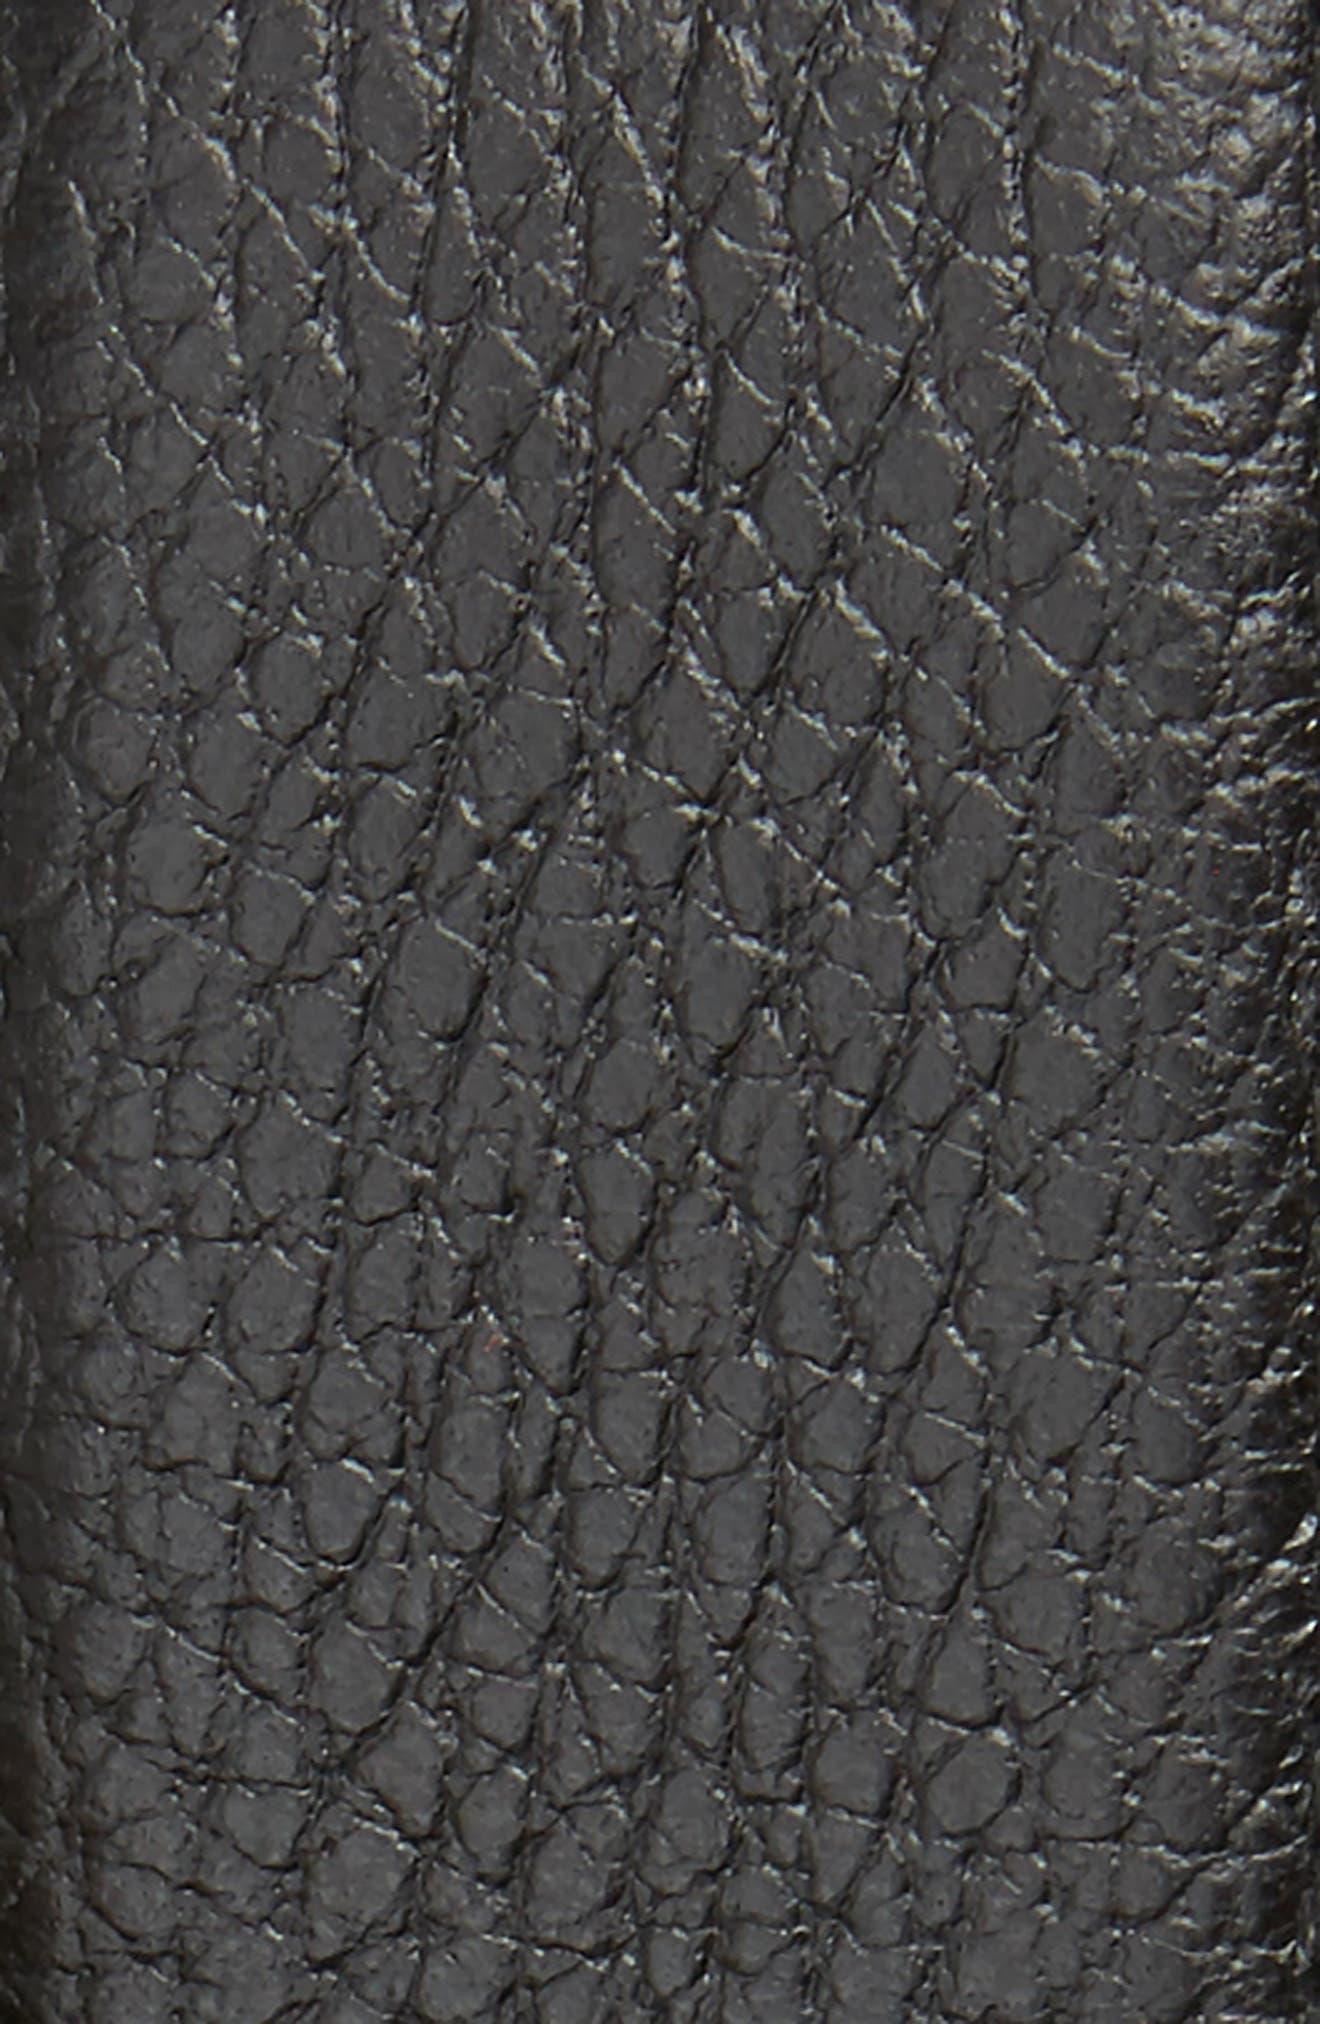 GUCCI, Interlocking-G Calfskin Leather Belt, Alternate thumbnail 2, color, BLACK